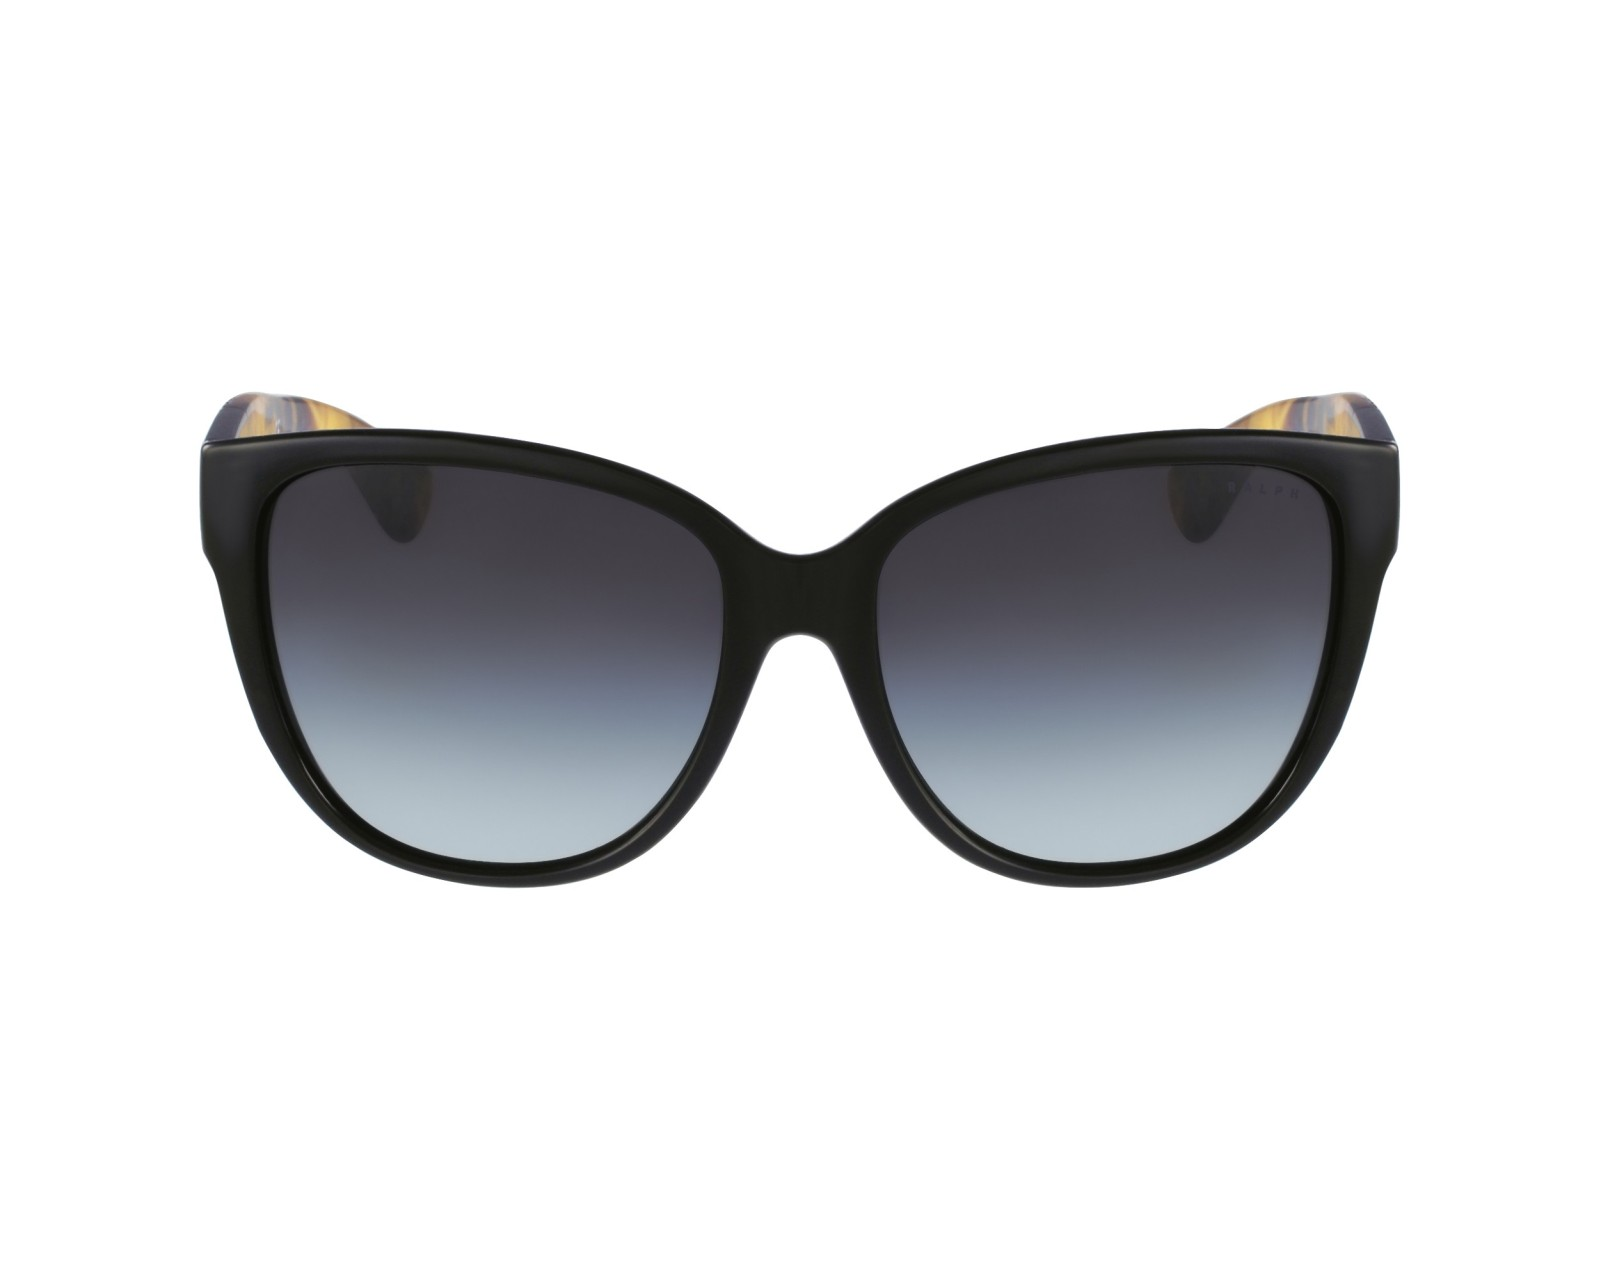 lunettes de soleil ralph by ralph lauren ra 5181 501 11. Black Bedroom Furniture Sets. Home Design Ideas